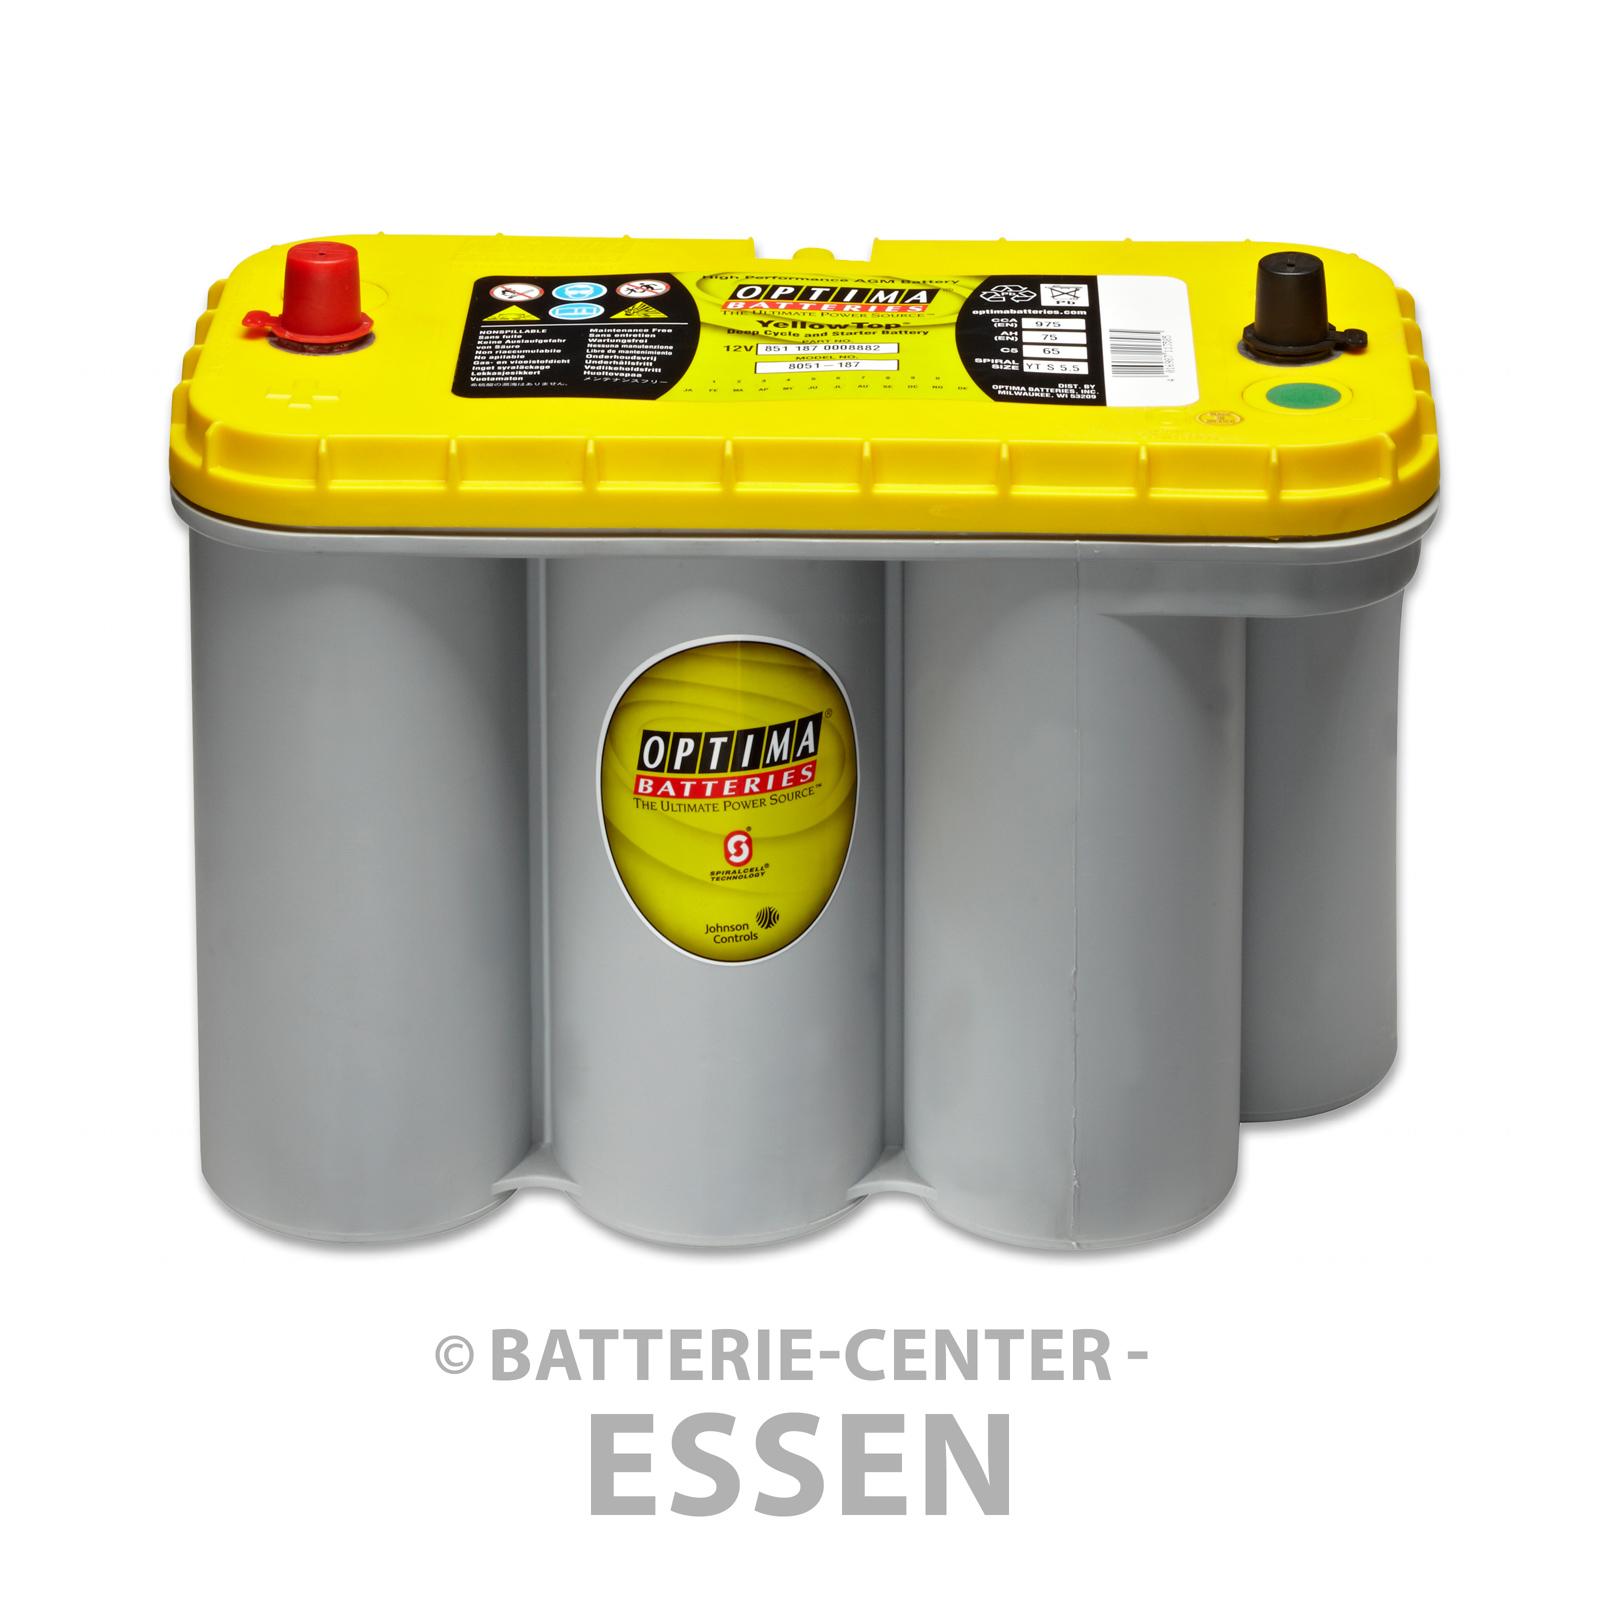 mover optima batterie yt s 5 5 12 v 75 ah yellow top wohnwagen ebay. Black Bedroom Furniture Sets. Home Design Ideas